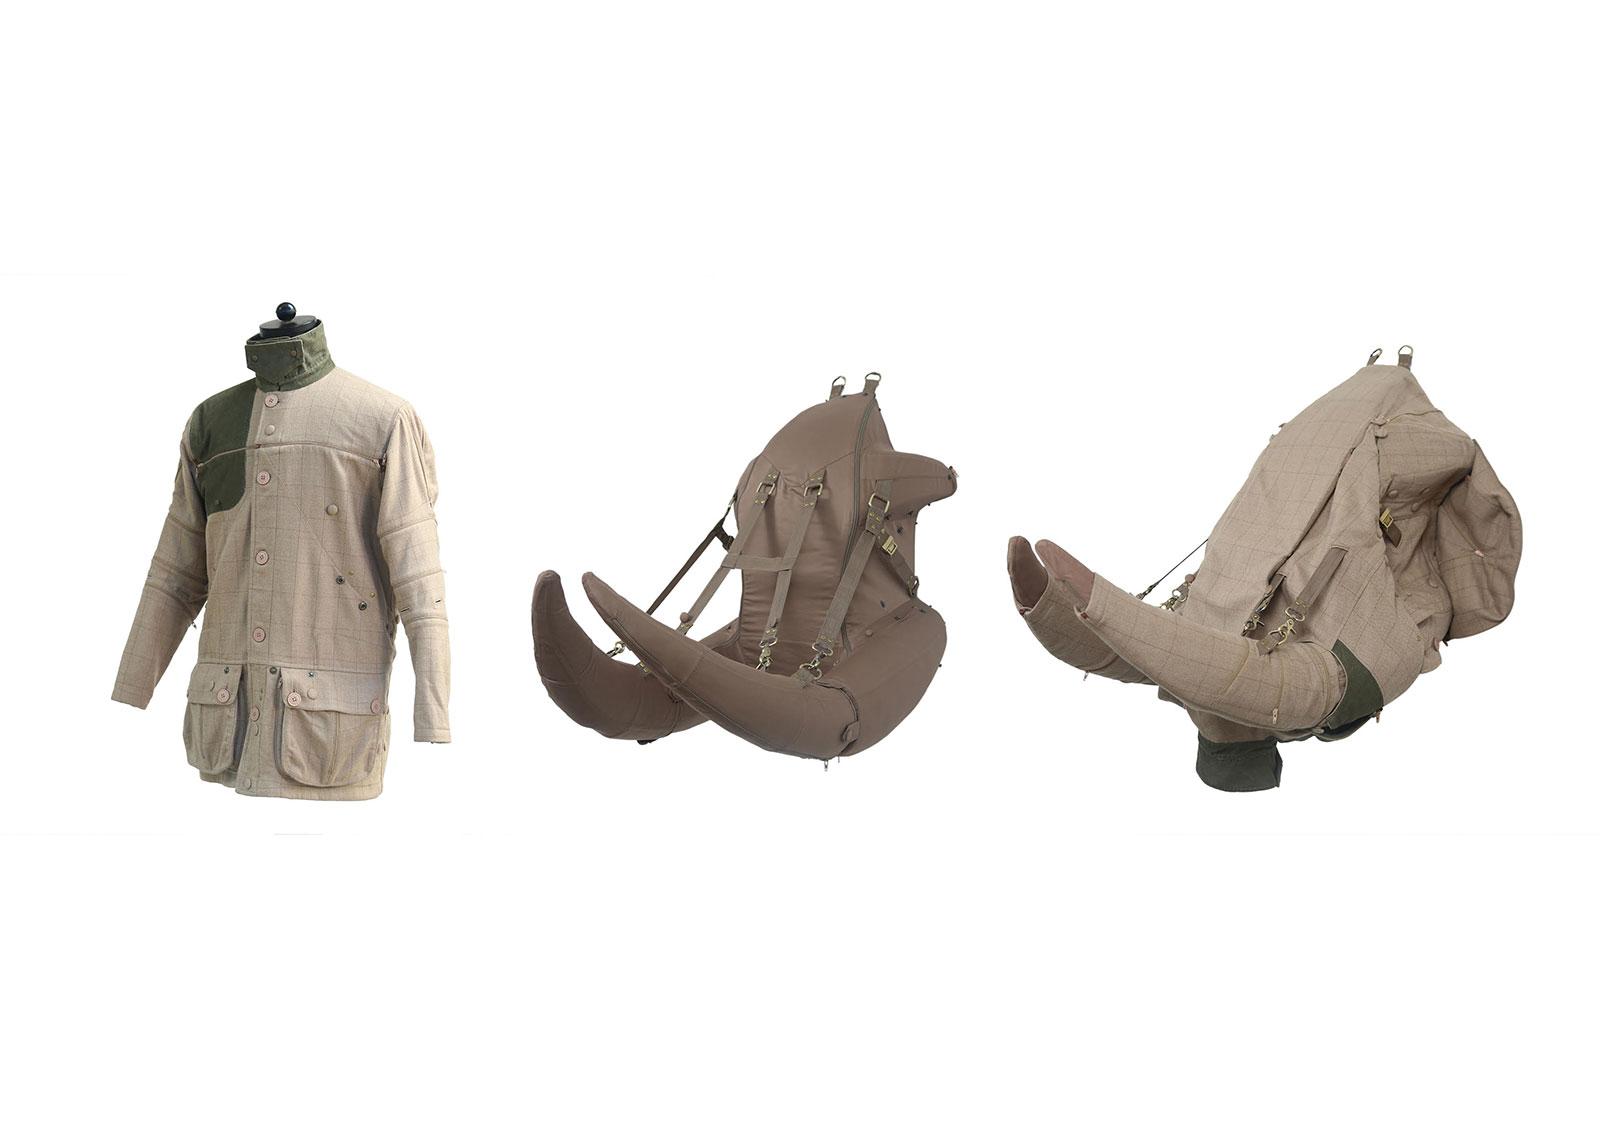 safari jacket that folds into the form of an elephant head